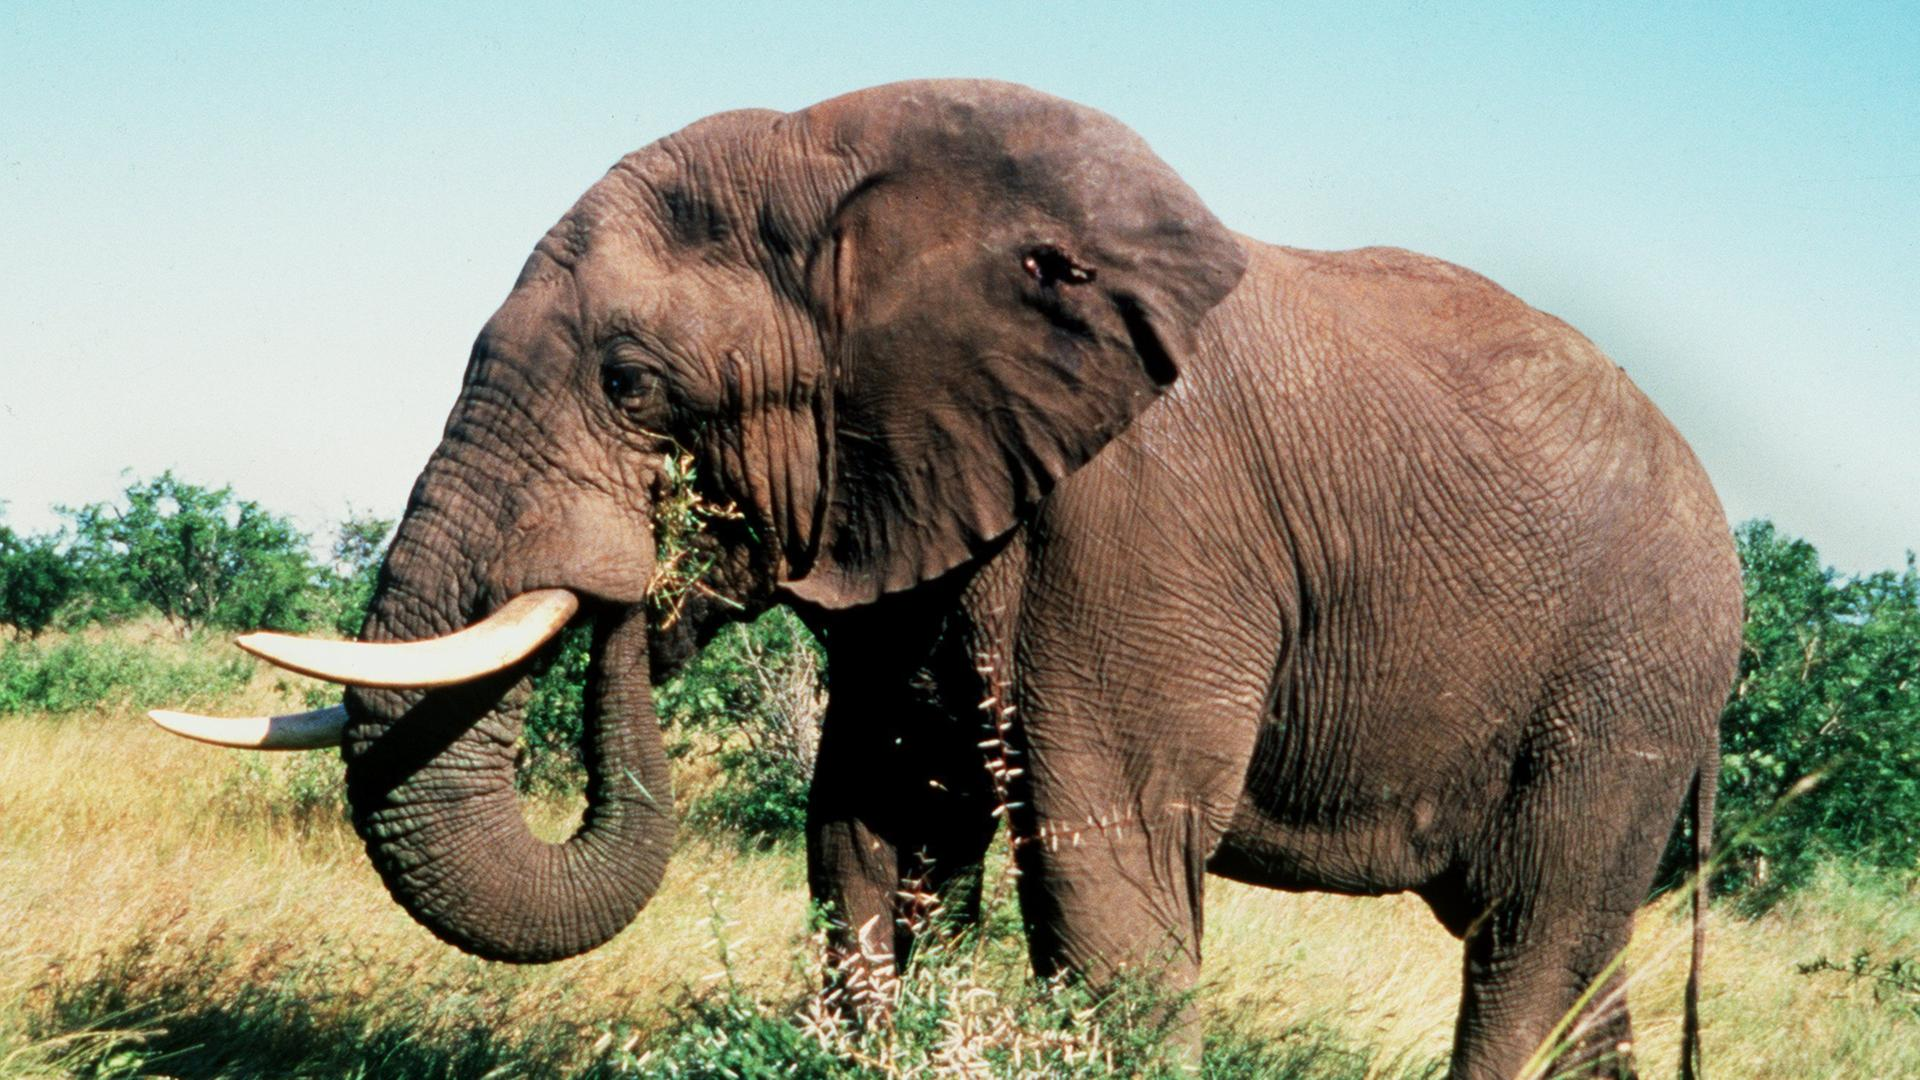 Wie lange dauert eine schwangerschaft bei elefanten